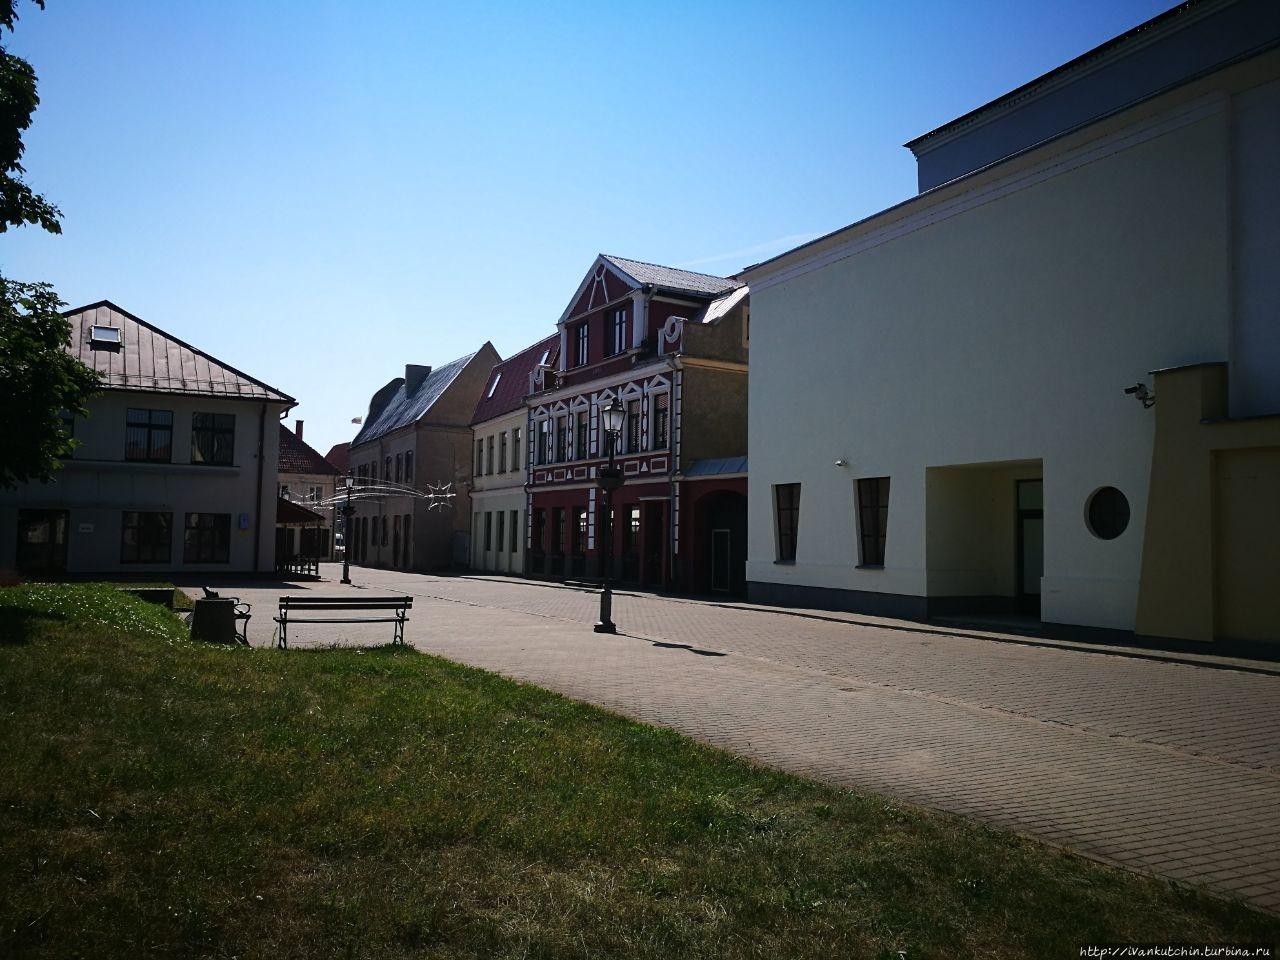 Прогулка по Кедайняю Кедайняй, Литва